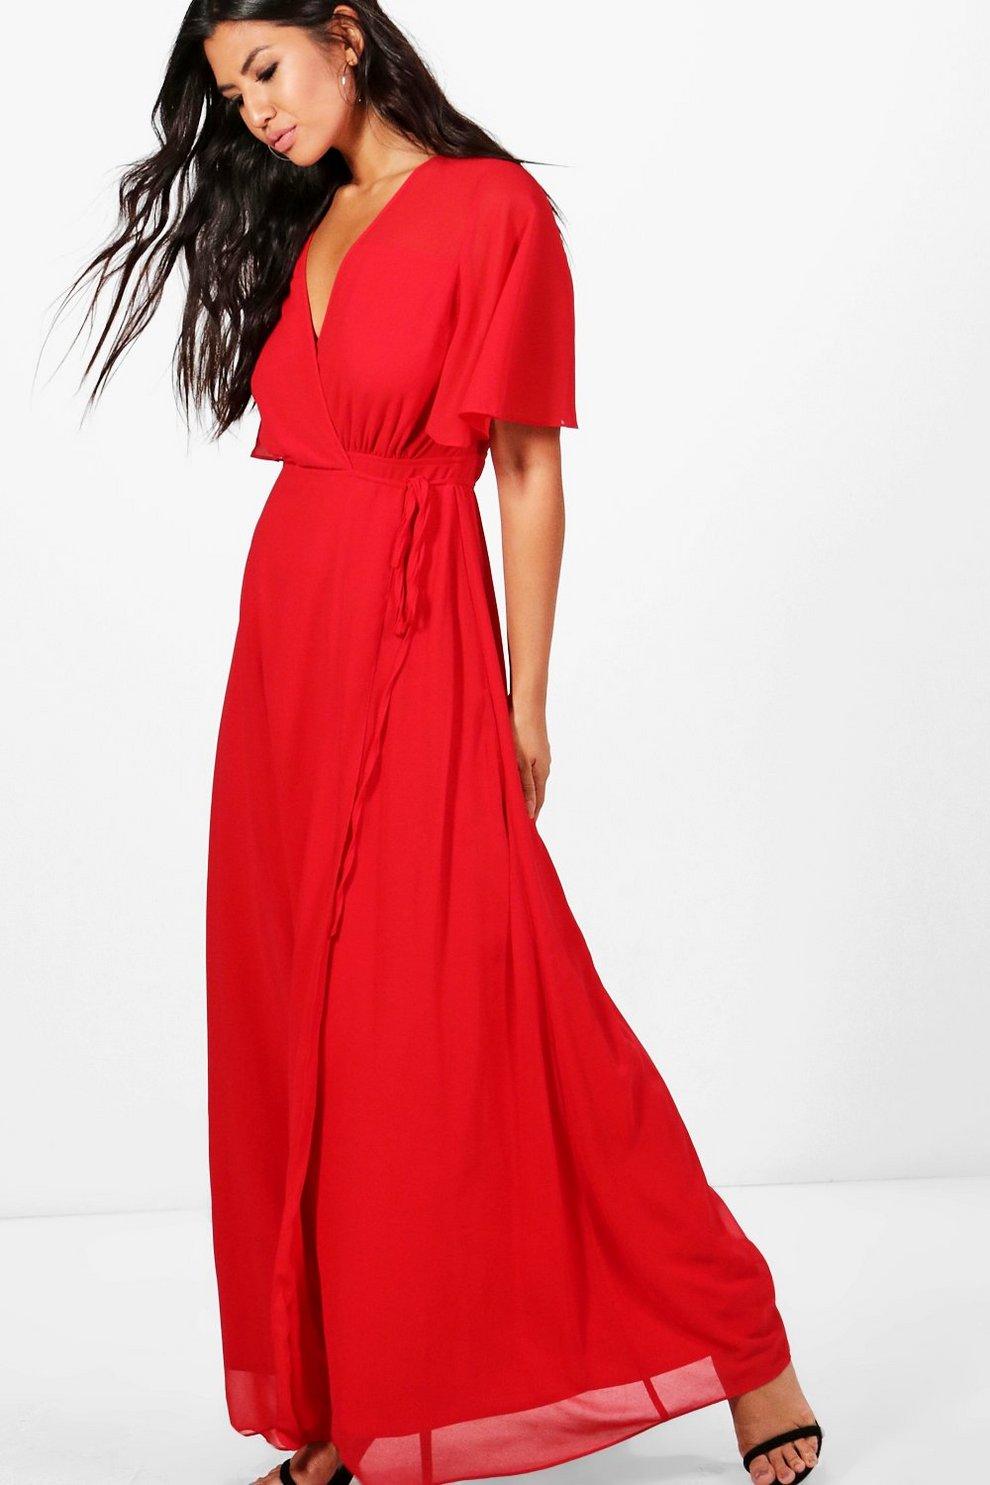 dbc60c49266f Chiffon Angel Sleeve Maxi Dress